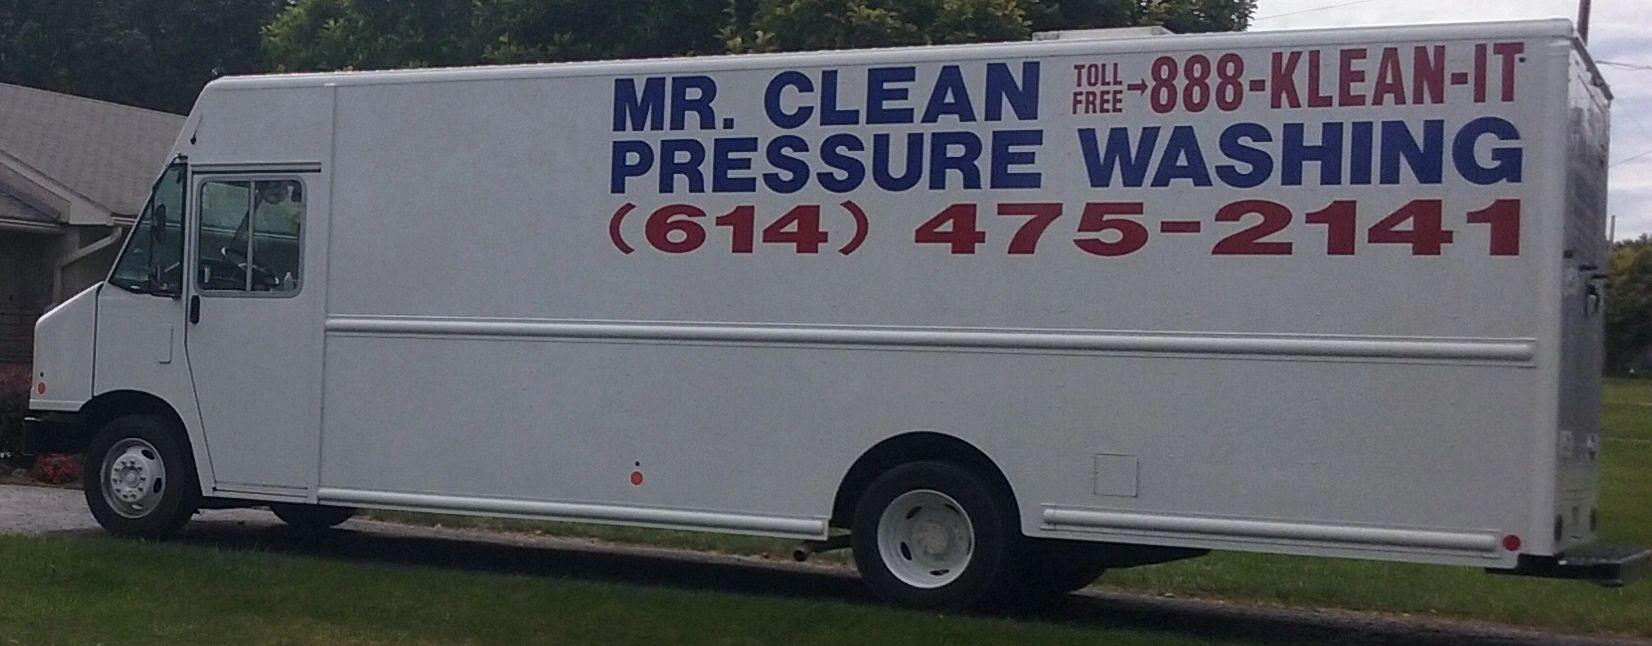 Vynal Siding Mr Clean Pressure Washing